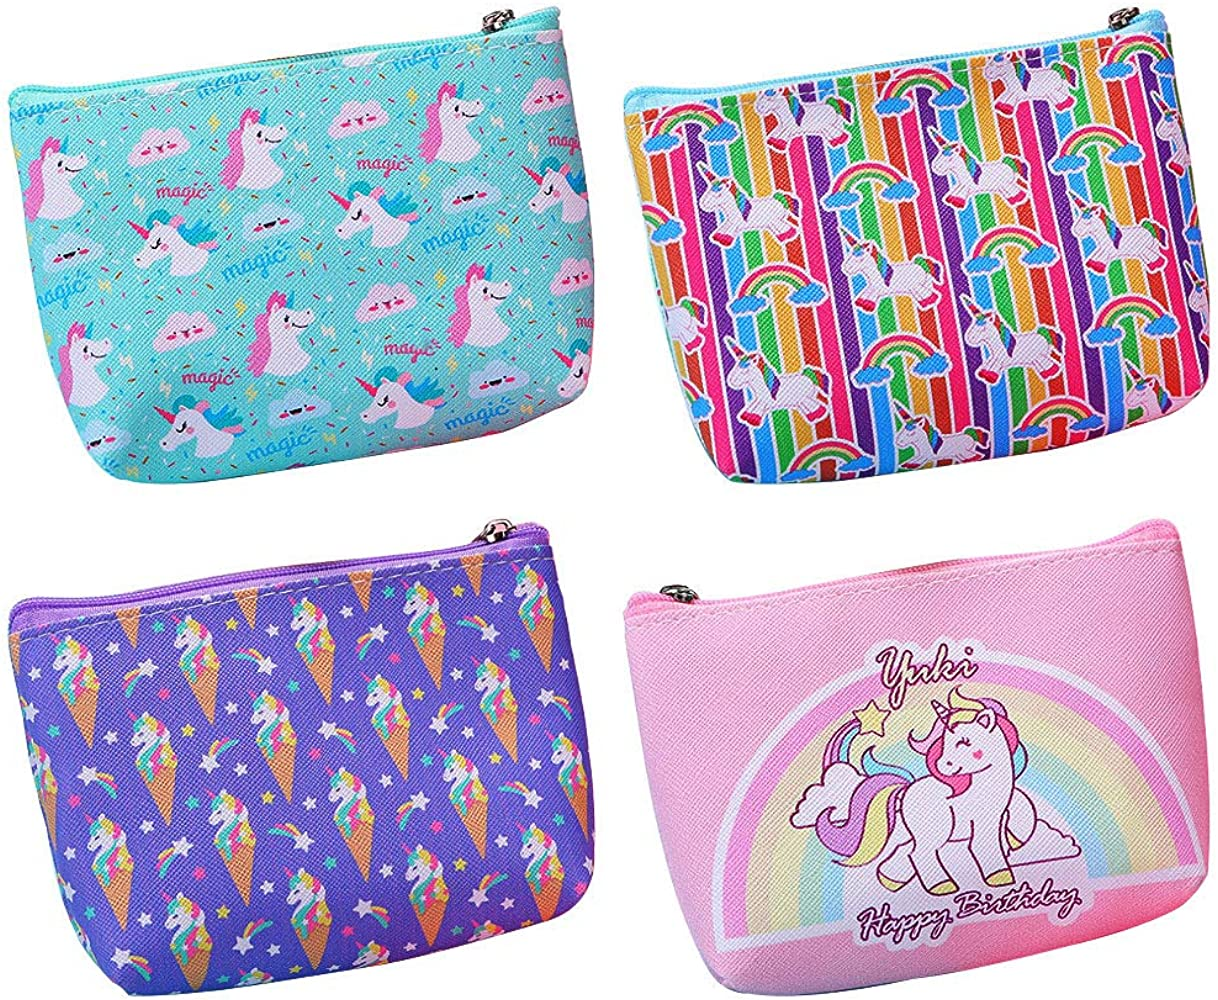 Personalized Card Pouch Personalized Unicorn Change Purse Personalized Unicorn Small Wallet